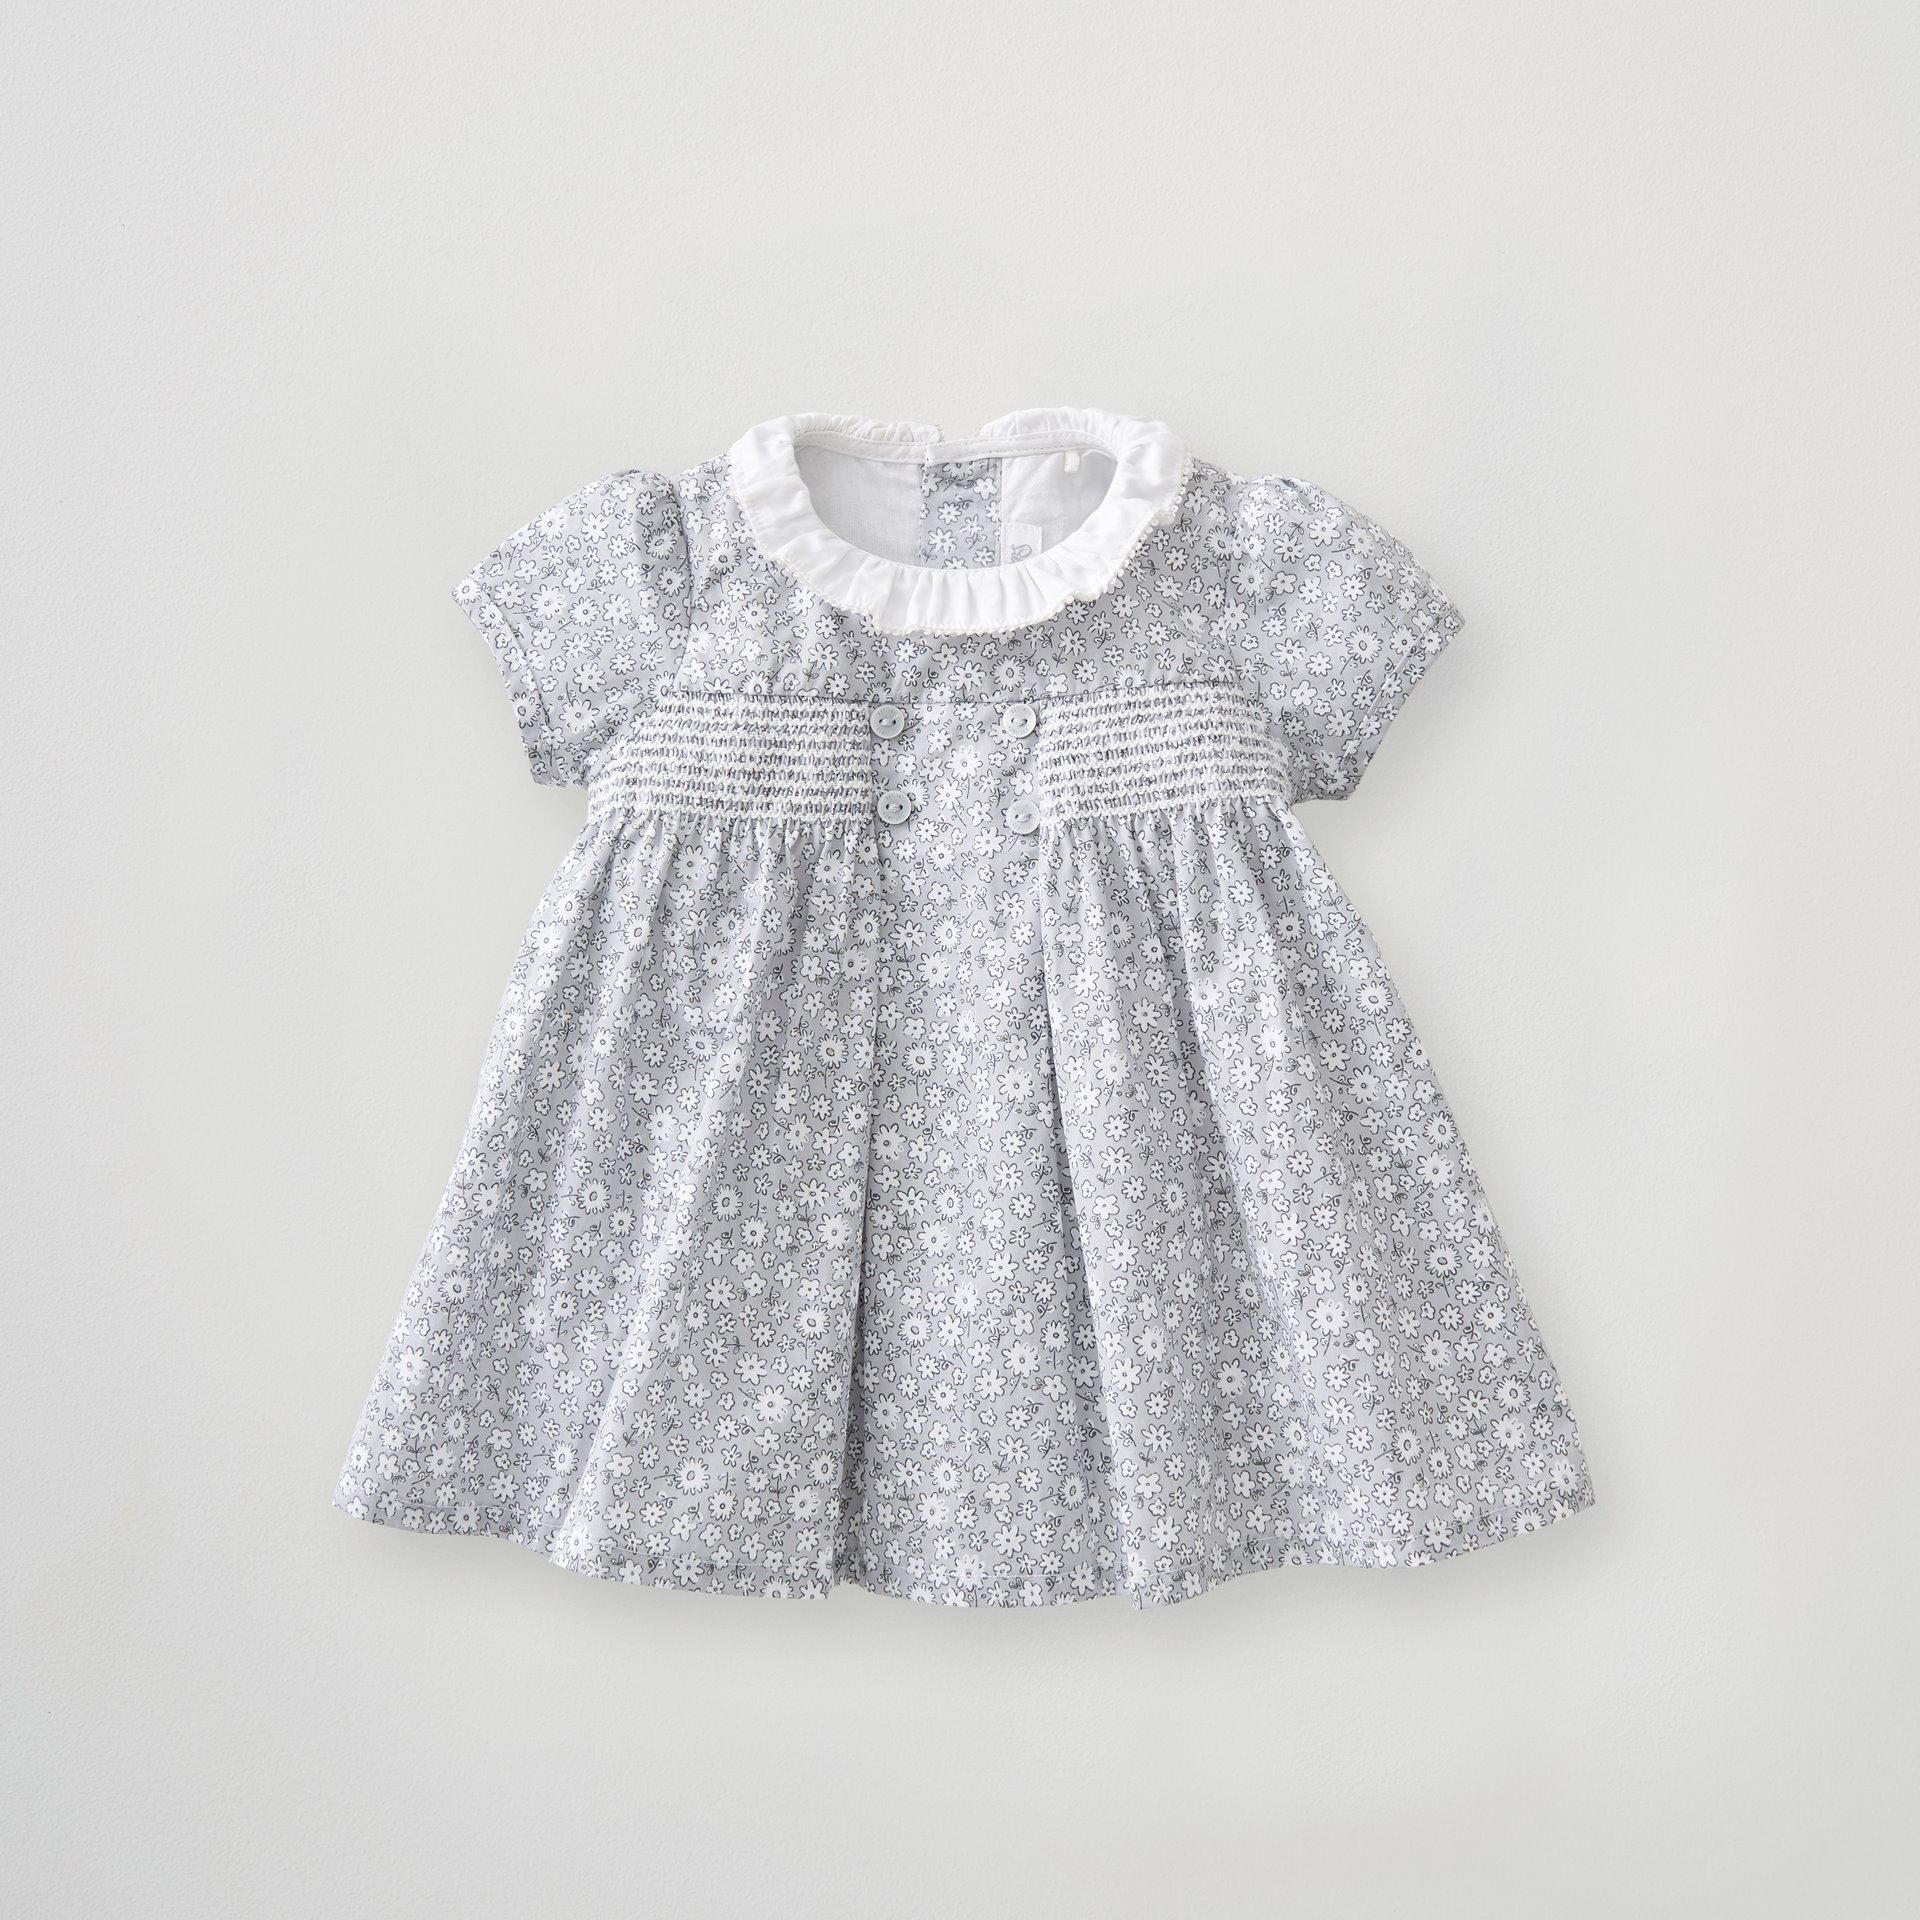 Girls Floral Smock Button Dress 3-6 Months